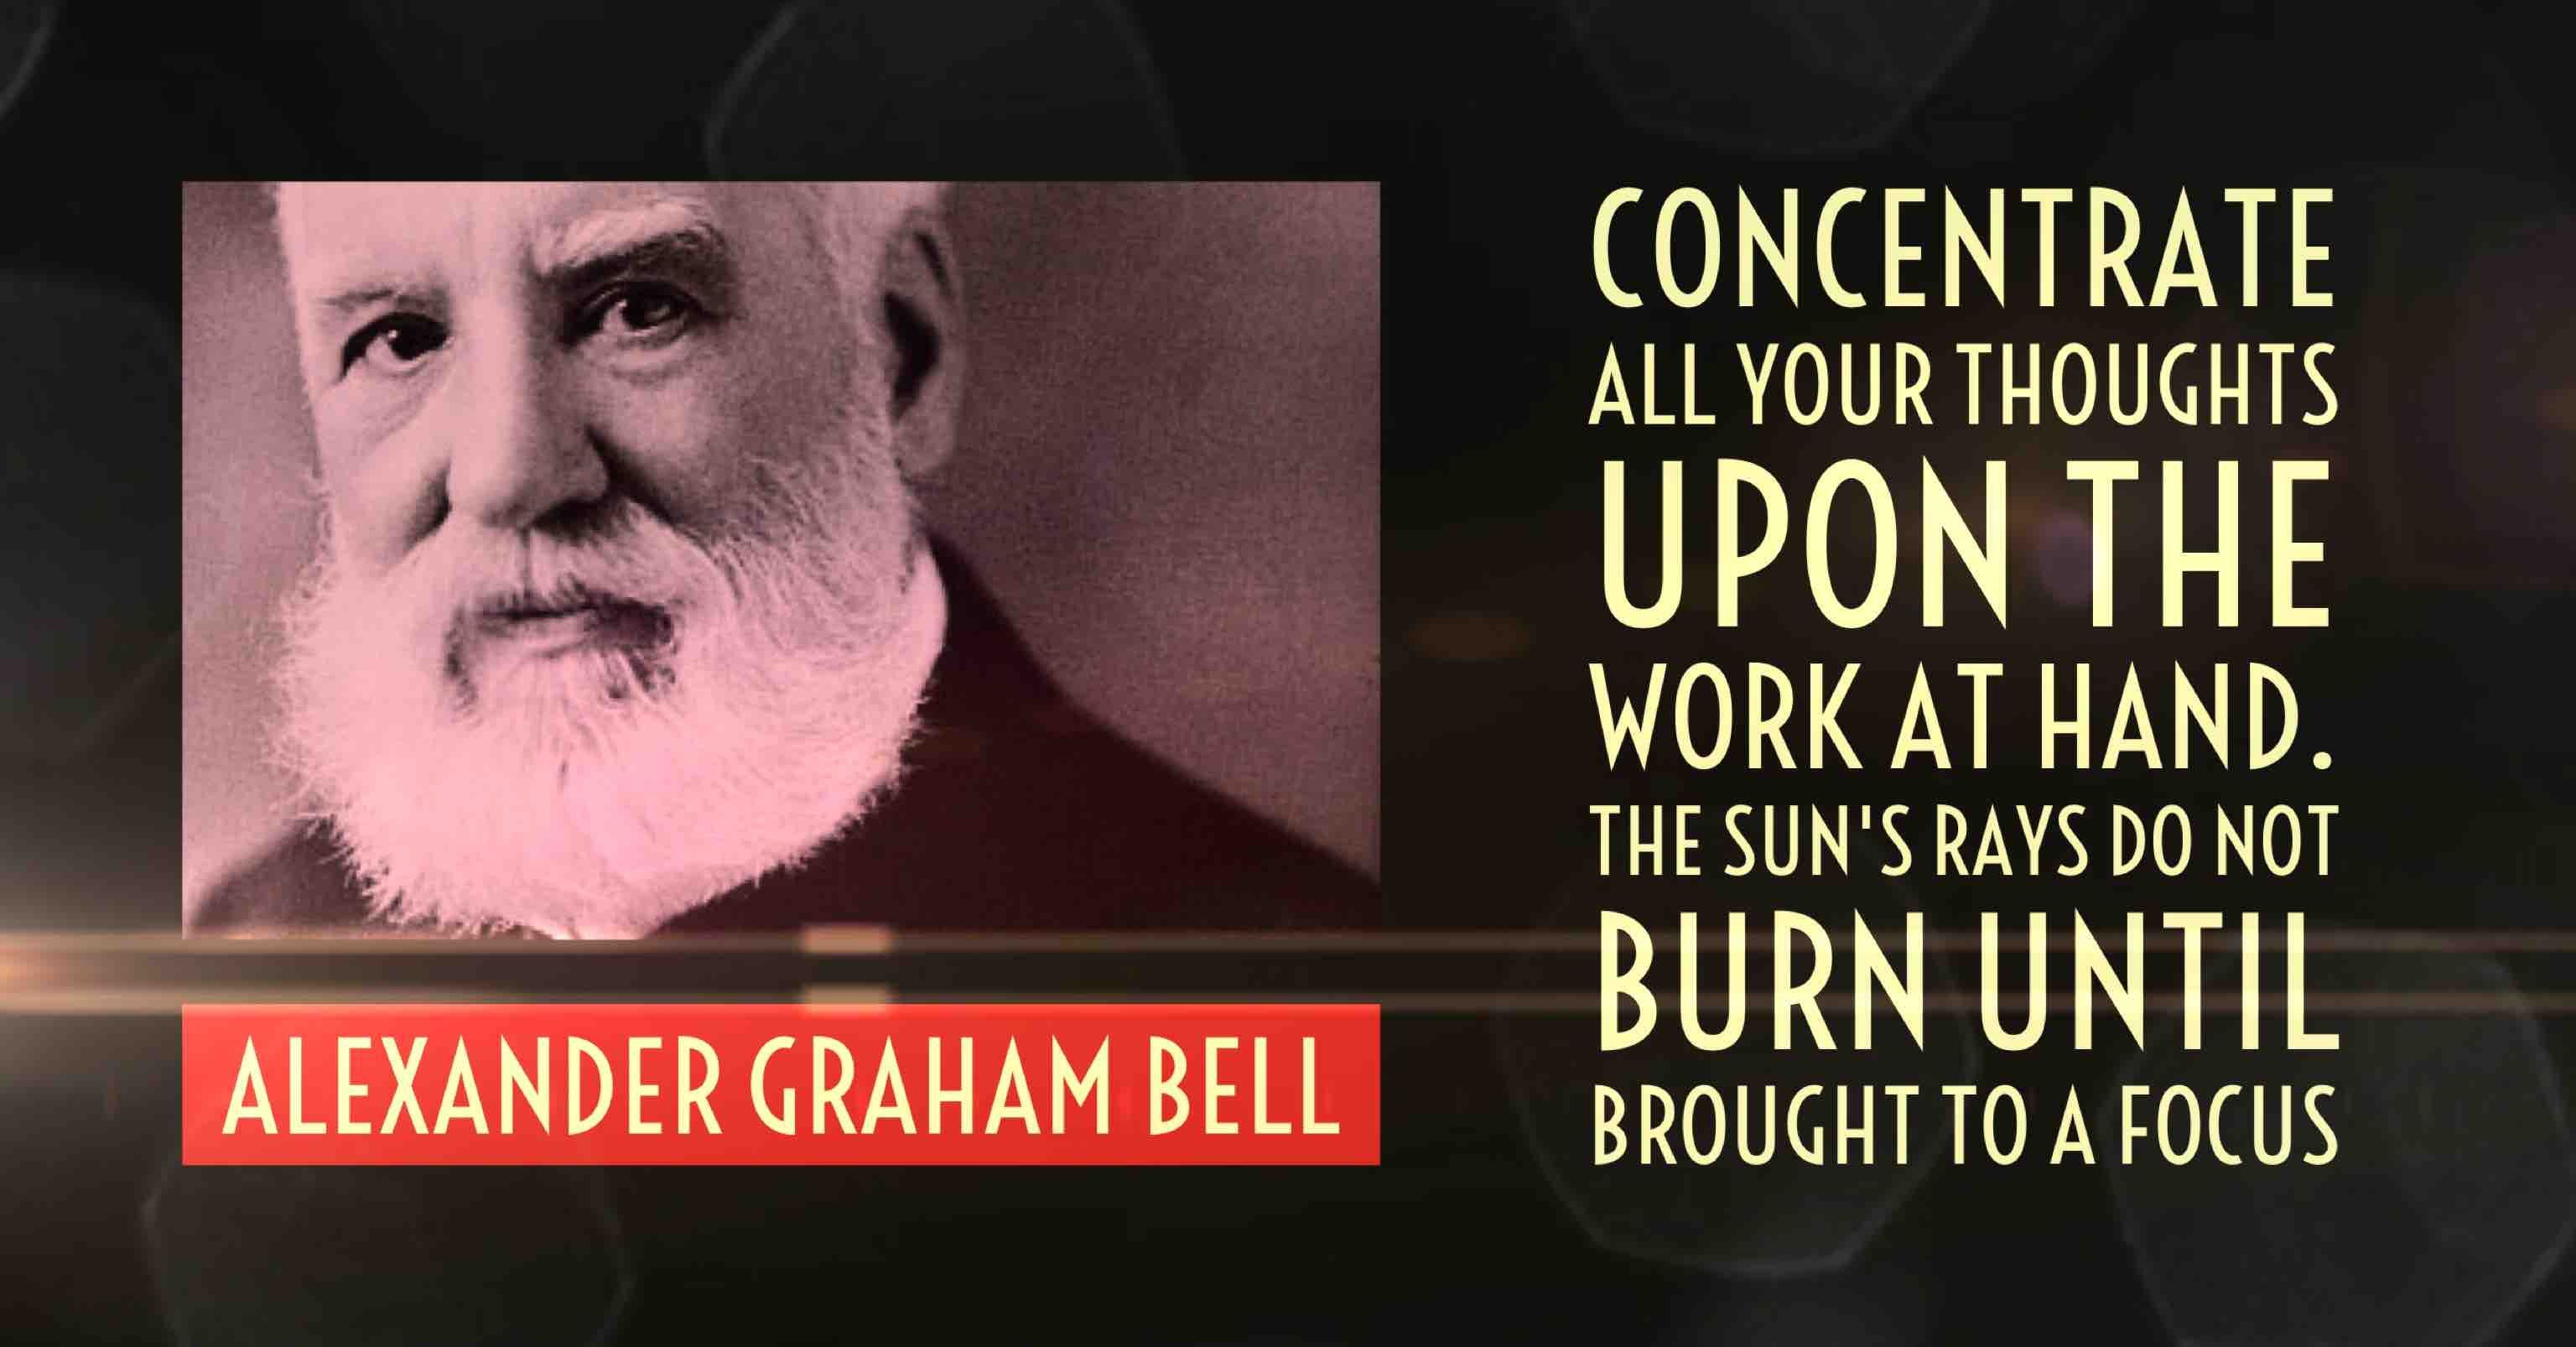 Alexander Graham Bell On Being Present Minded